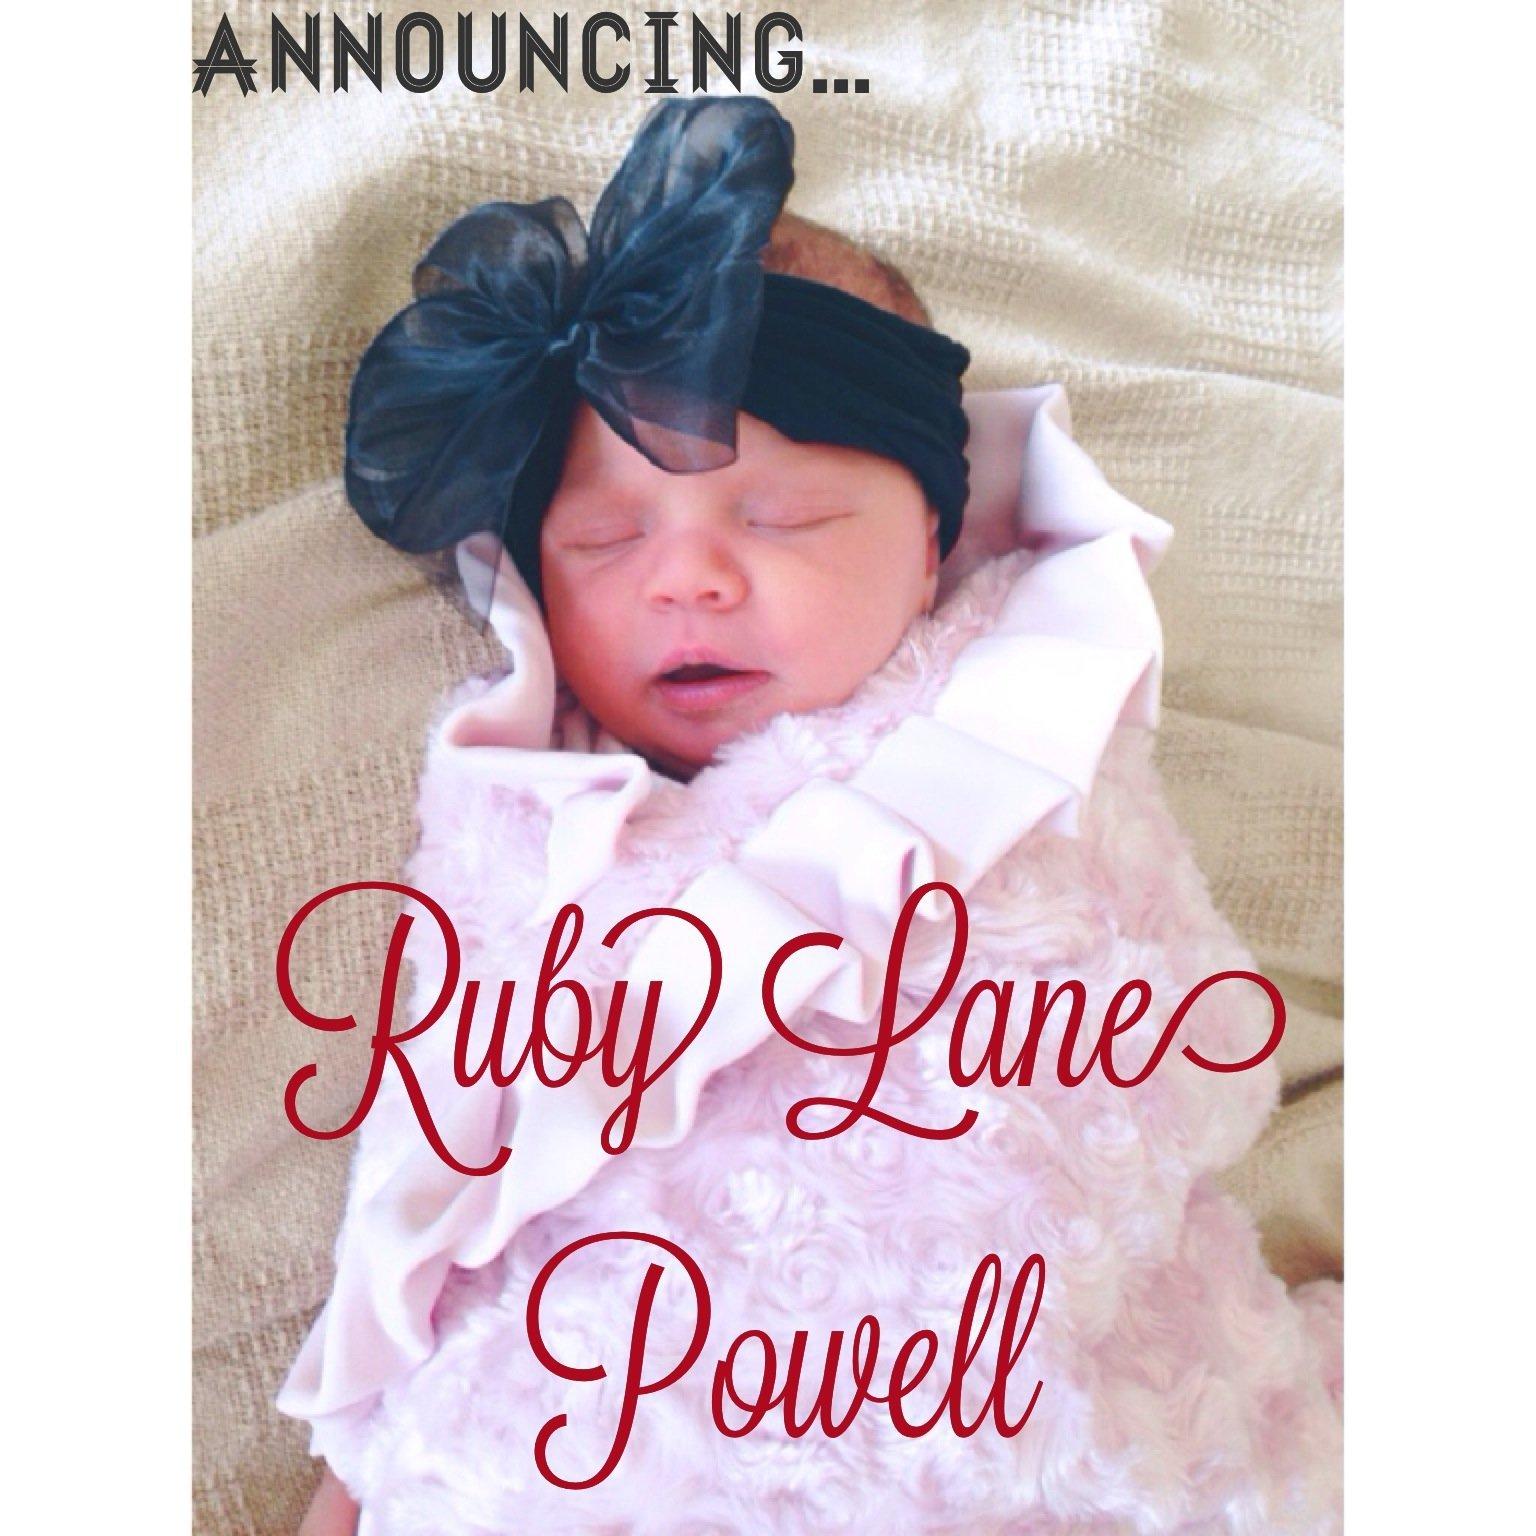 #BabyPowell #RubyPowell #PowellPack